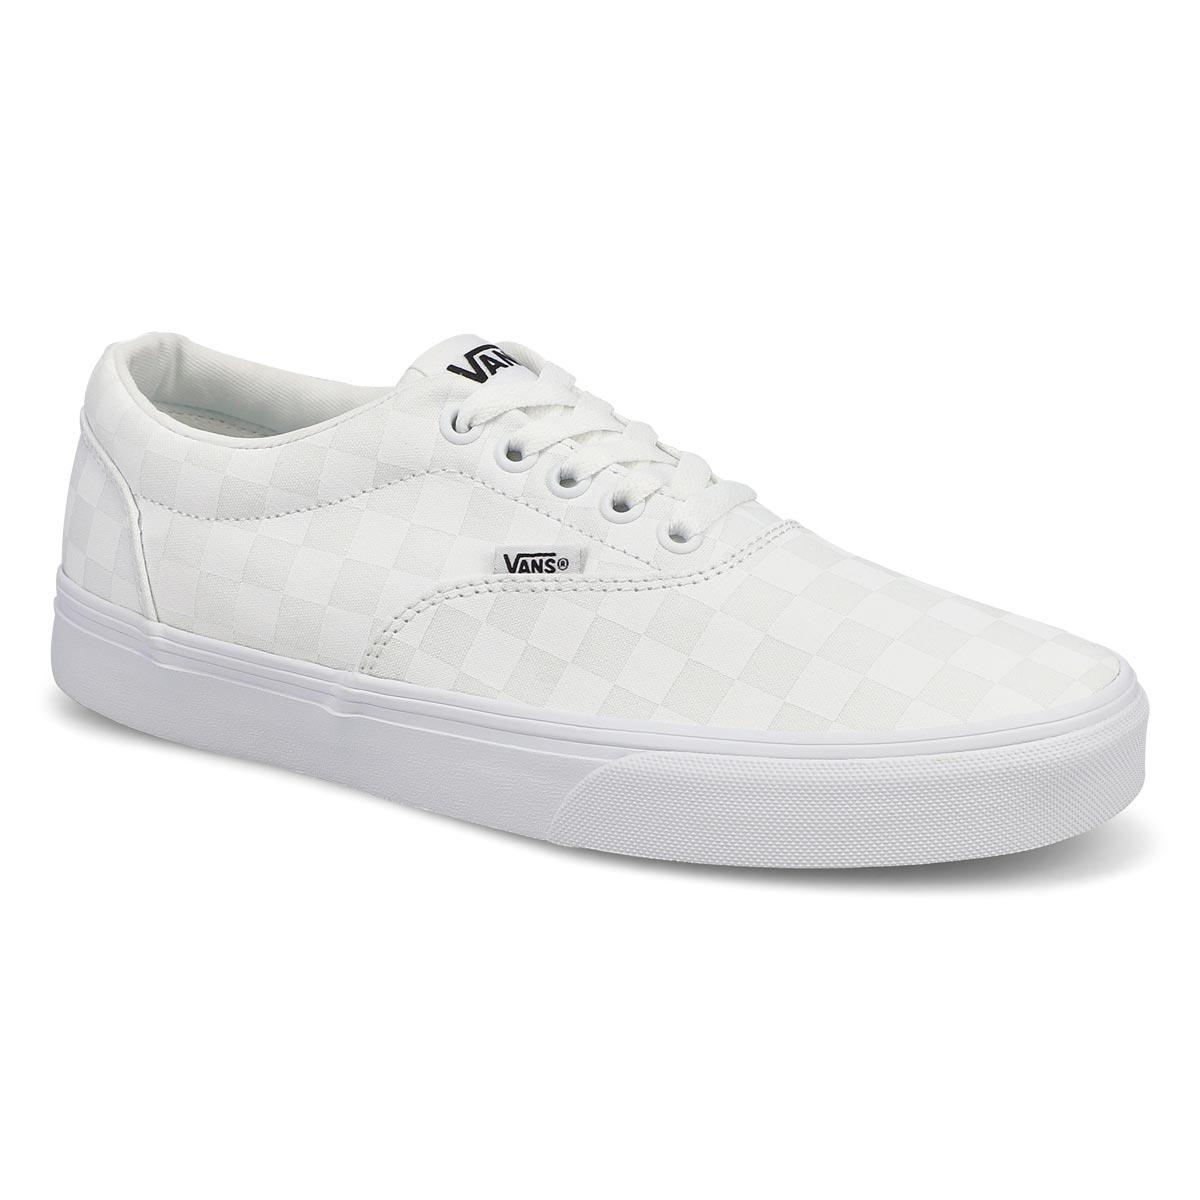 Men's Doheny Sneaker - Checkered White/White